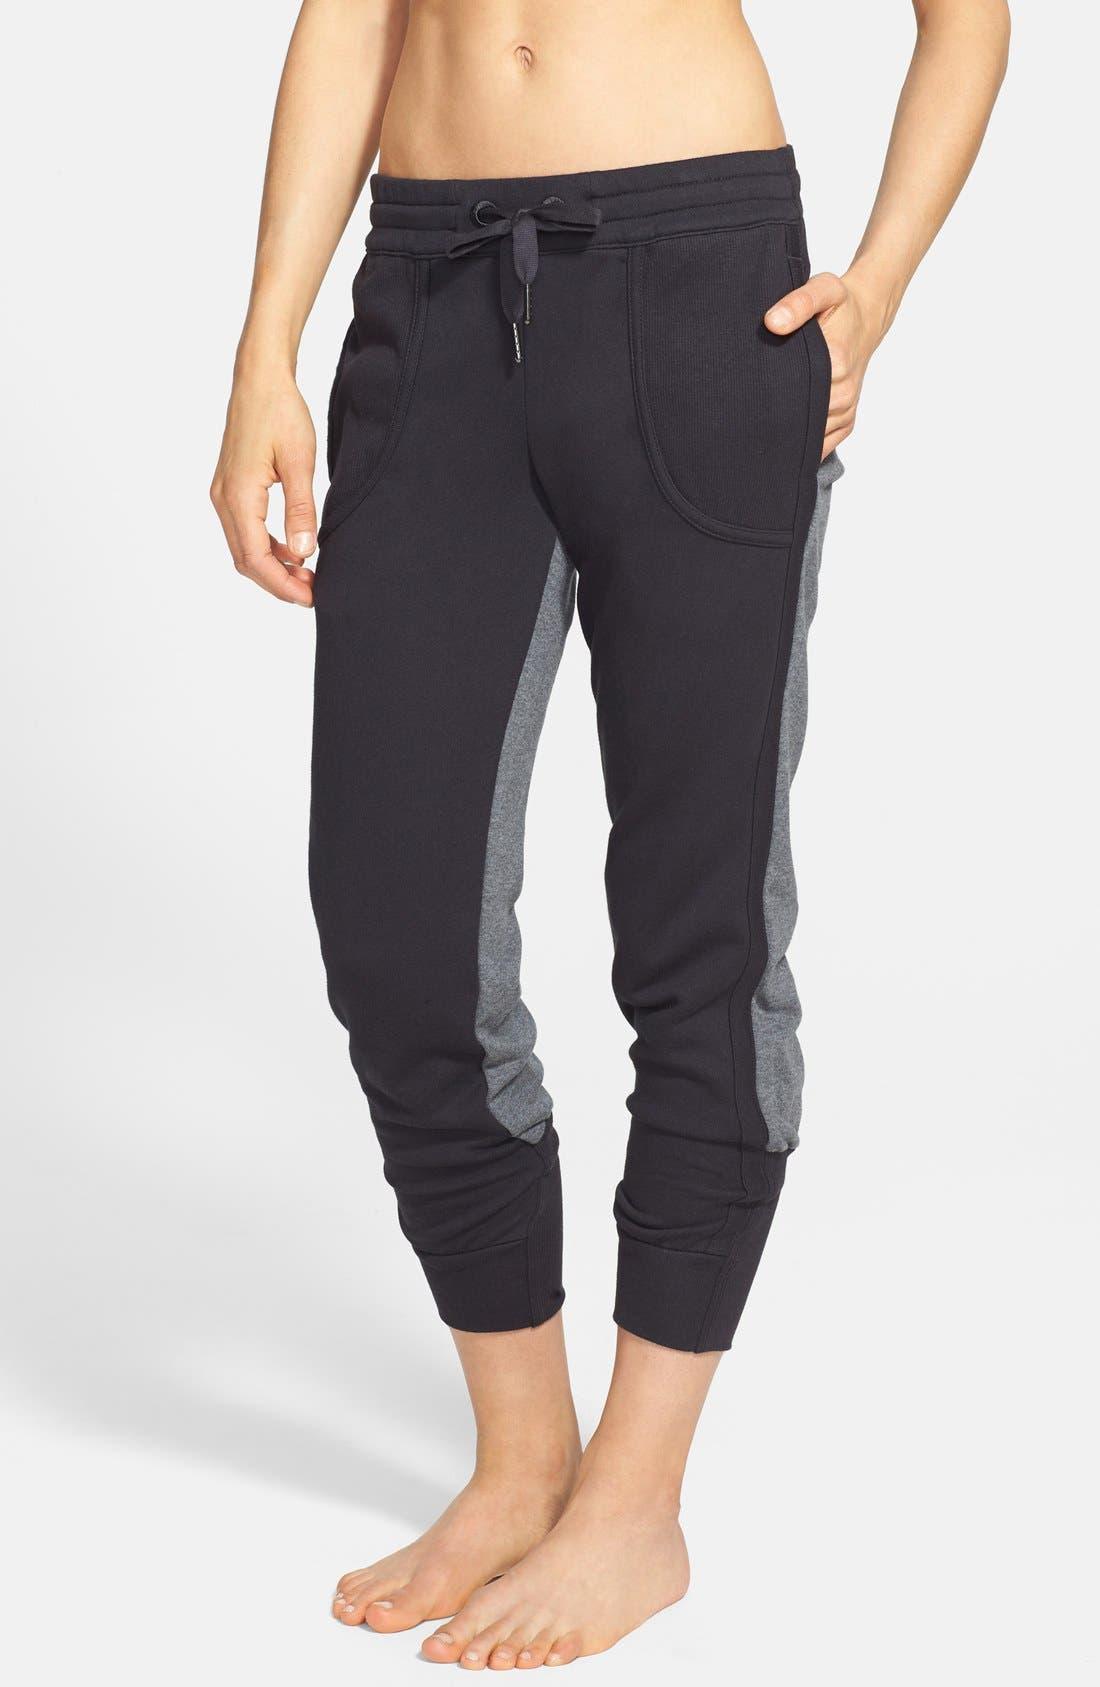 Main Image - adidas by Stella McCartney 'Essentials' Colorblock Sweatpants